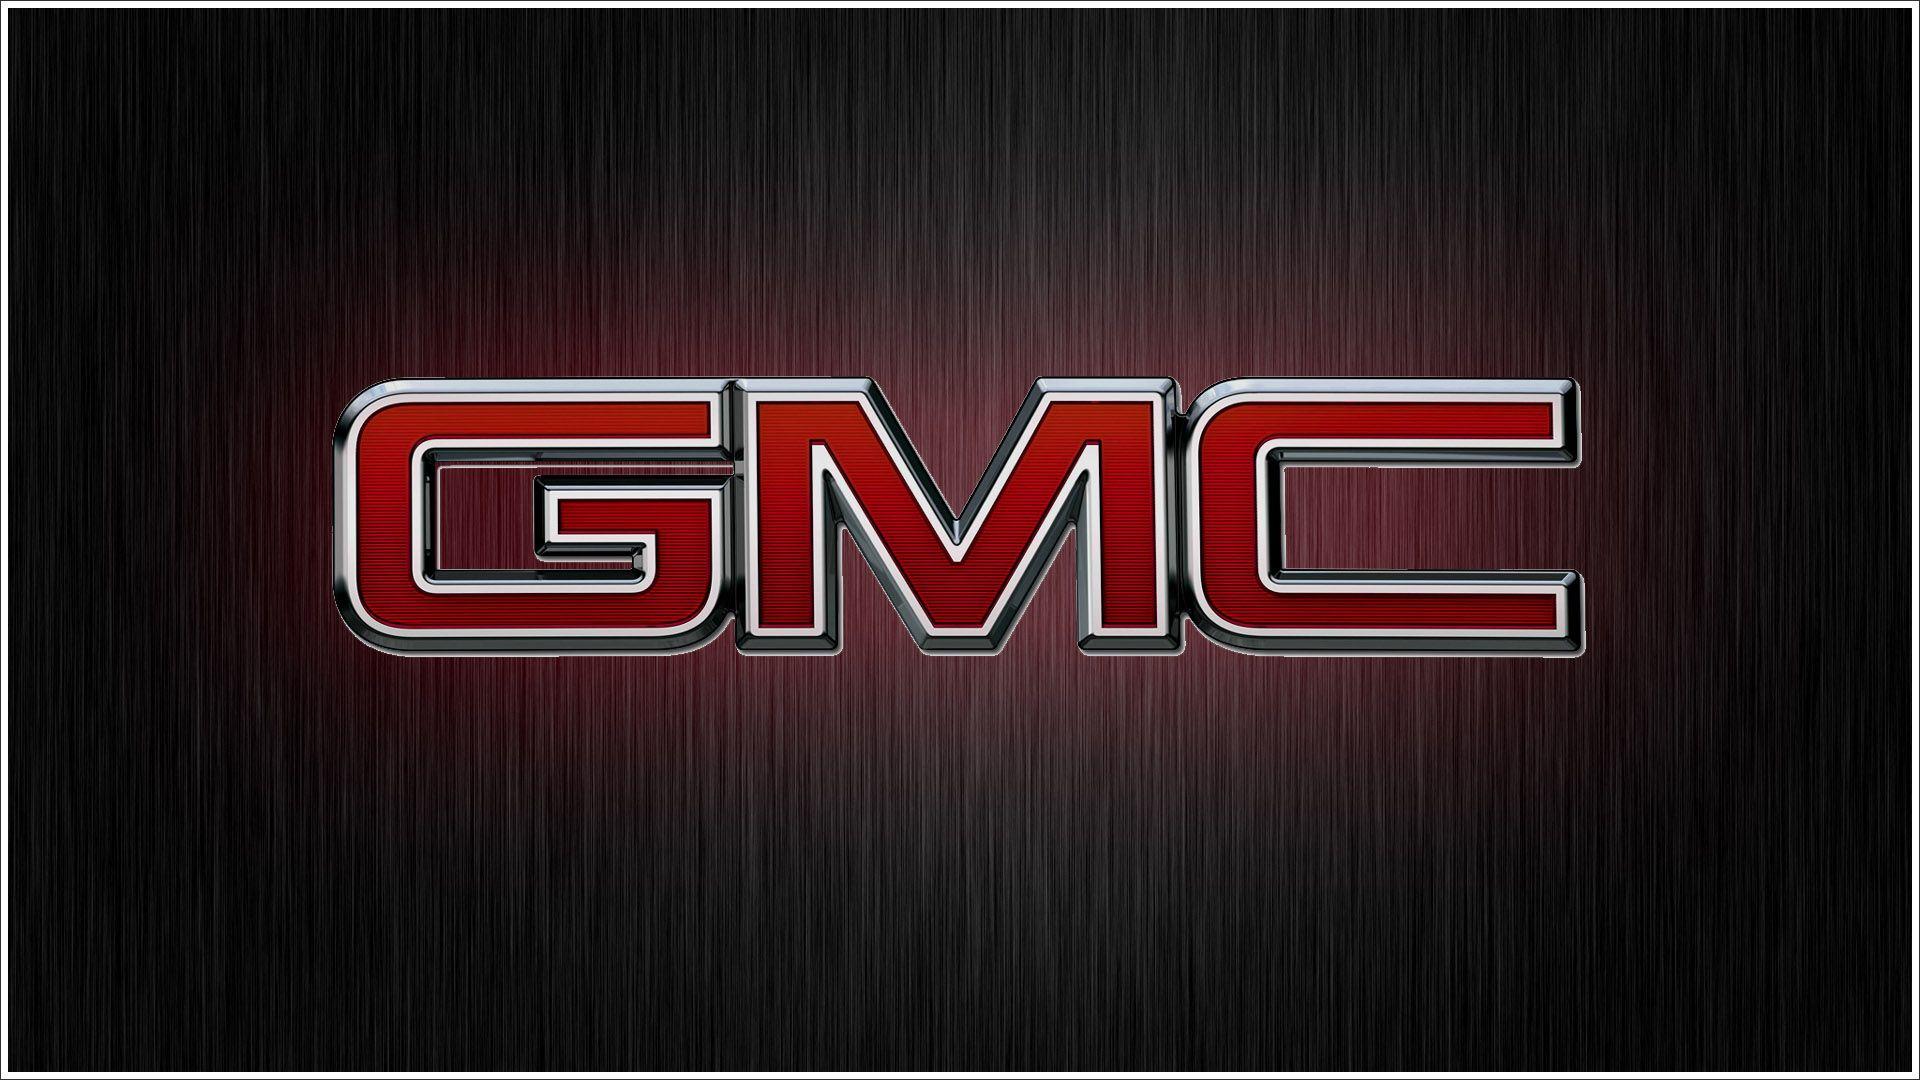 Http Listcarbrands Com Wp Content Uploads 2016 03 Gmc Logos Jpg Gmc Logos Chevy